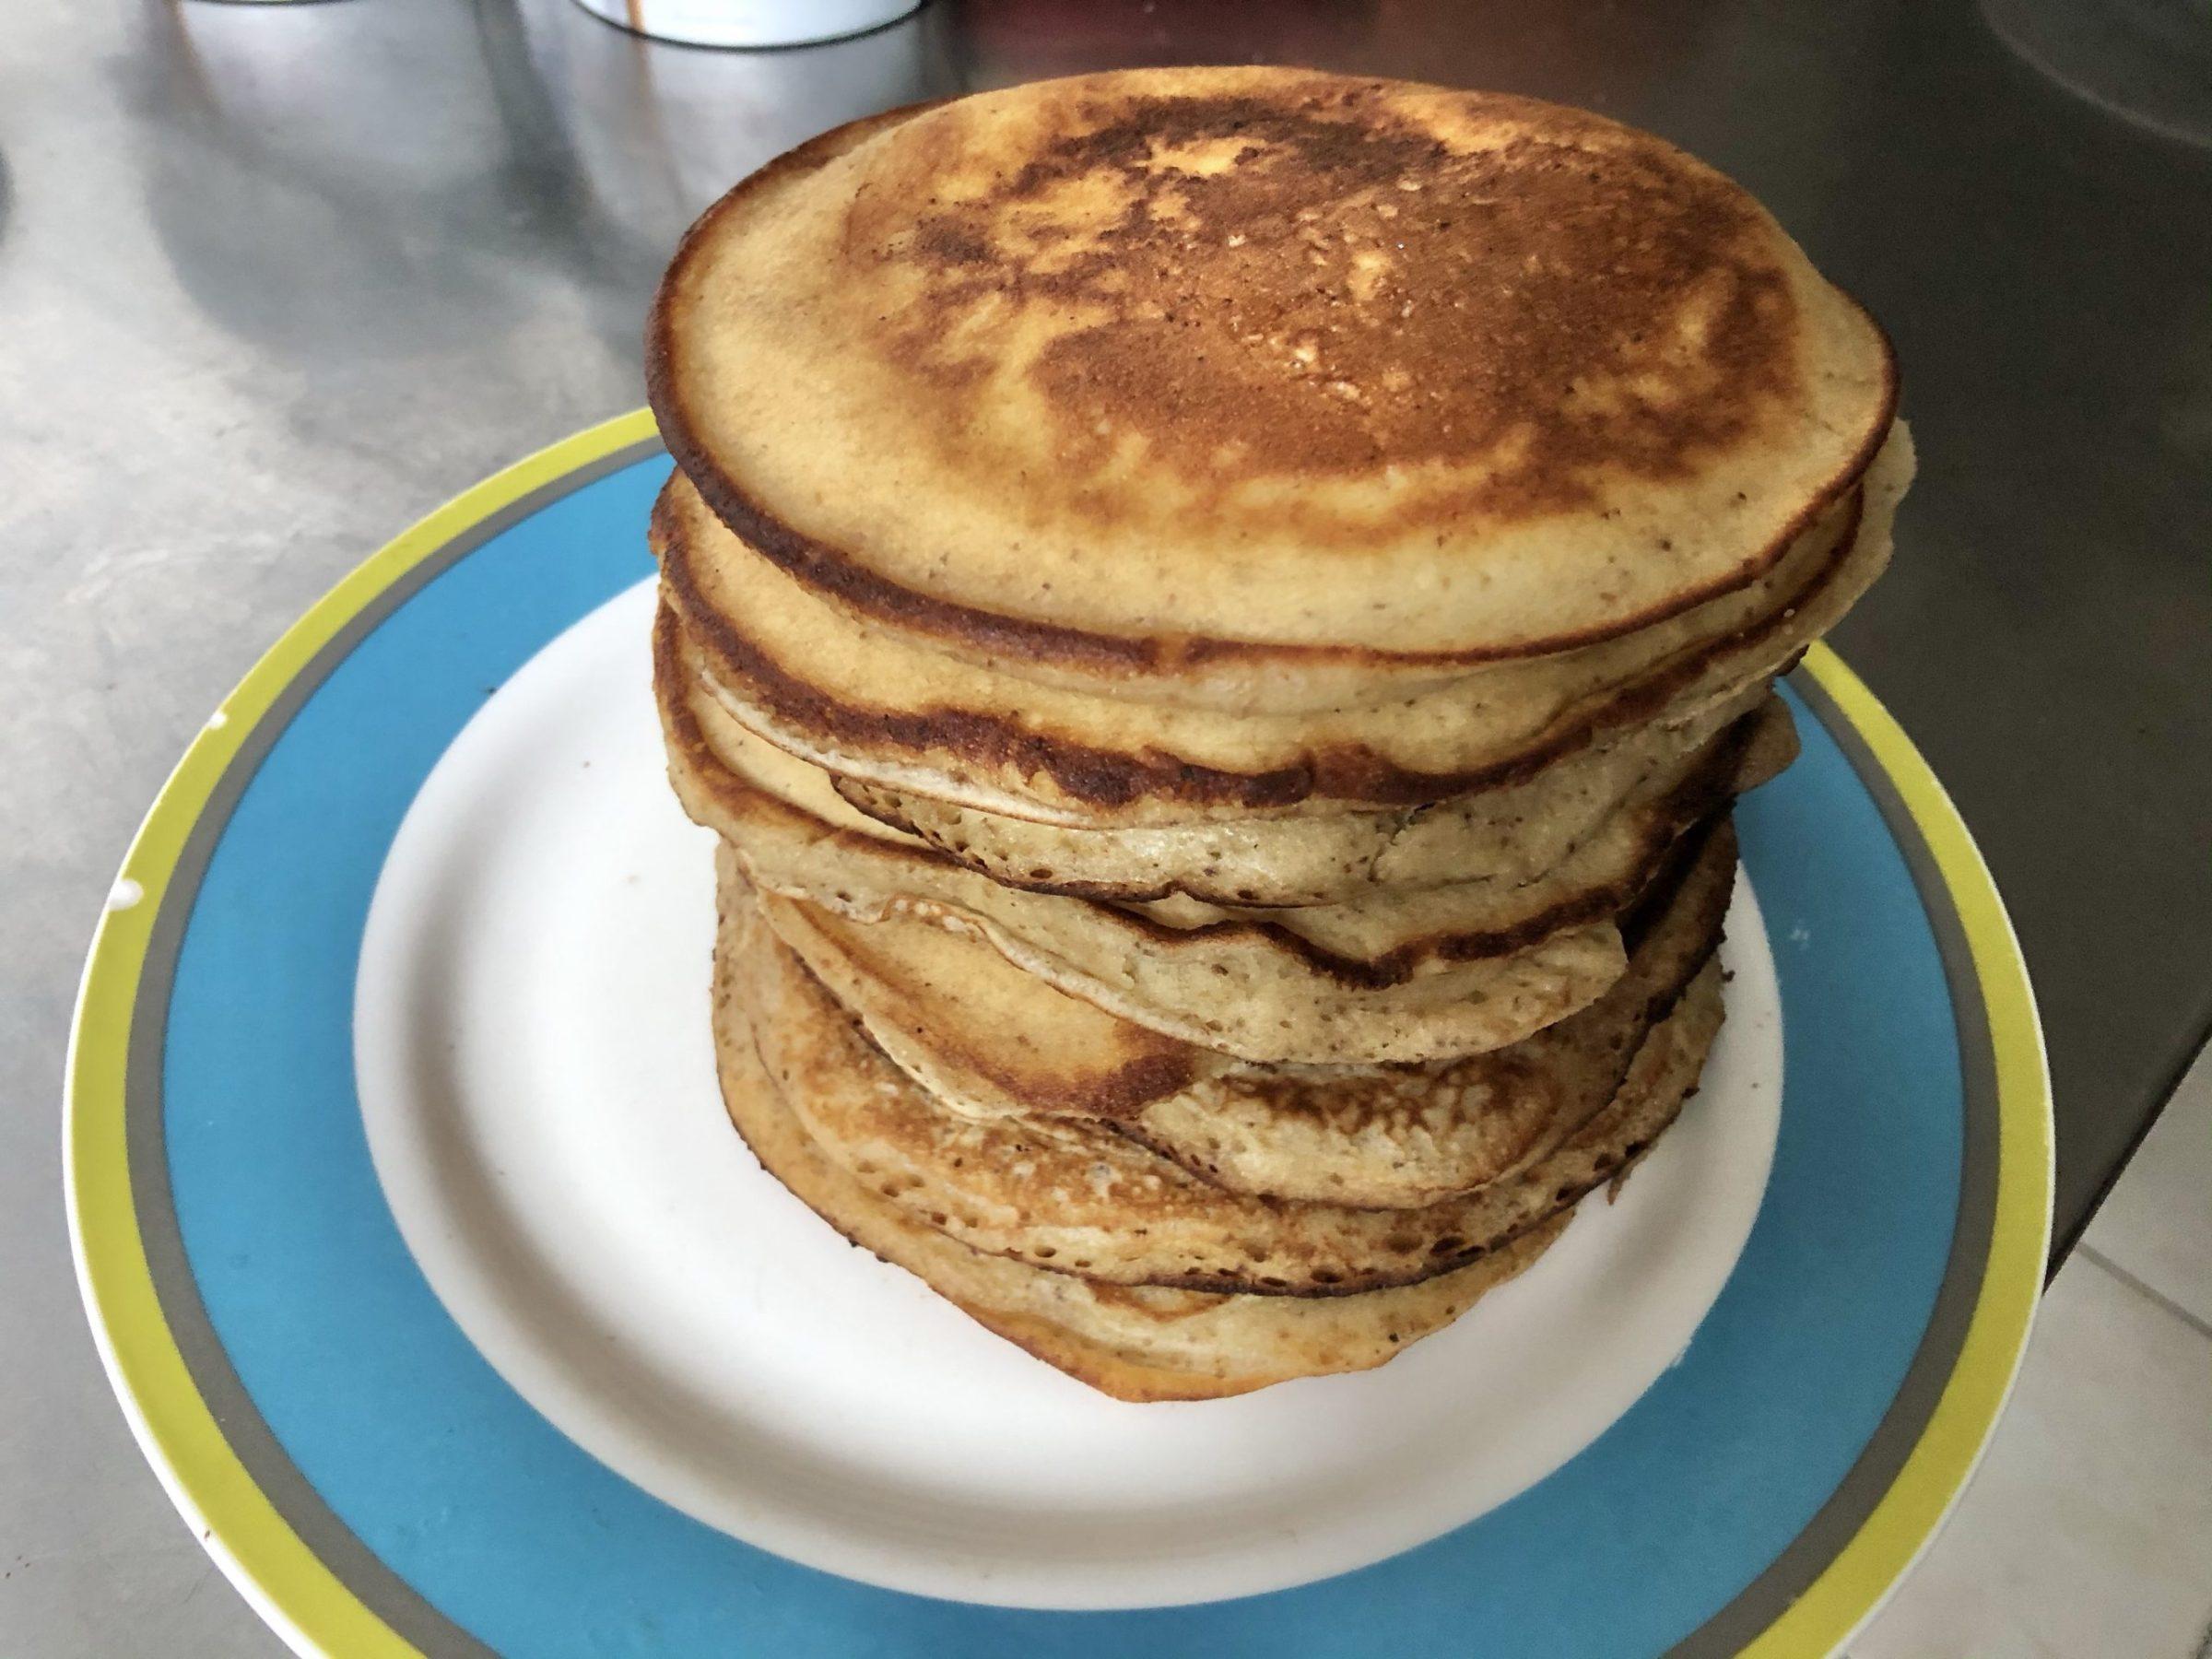 Chestnut pancakes